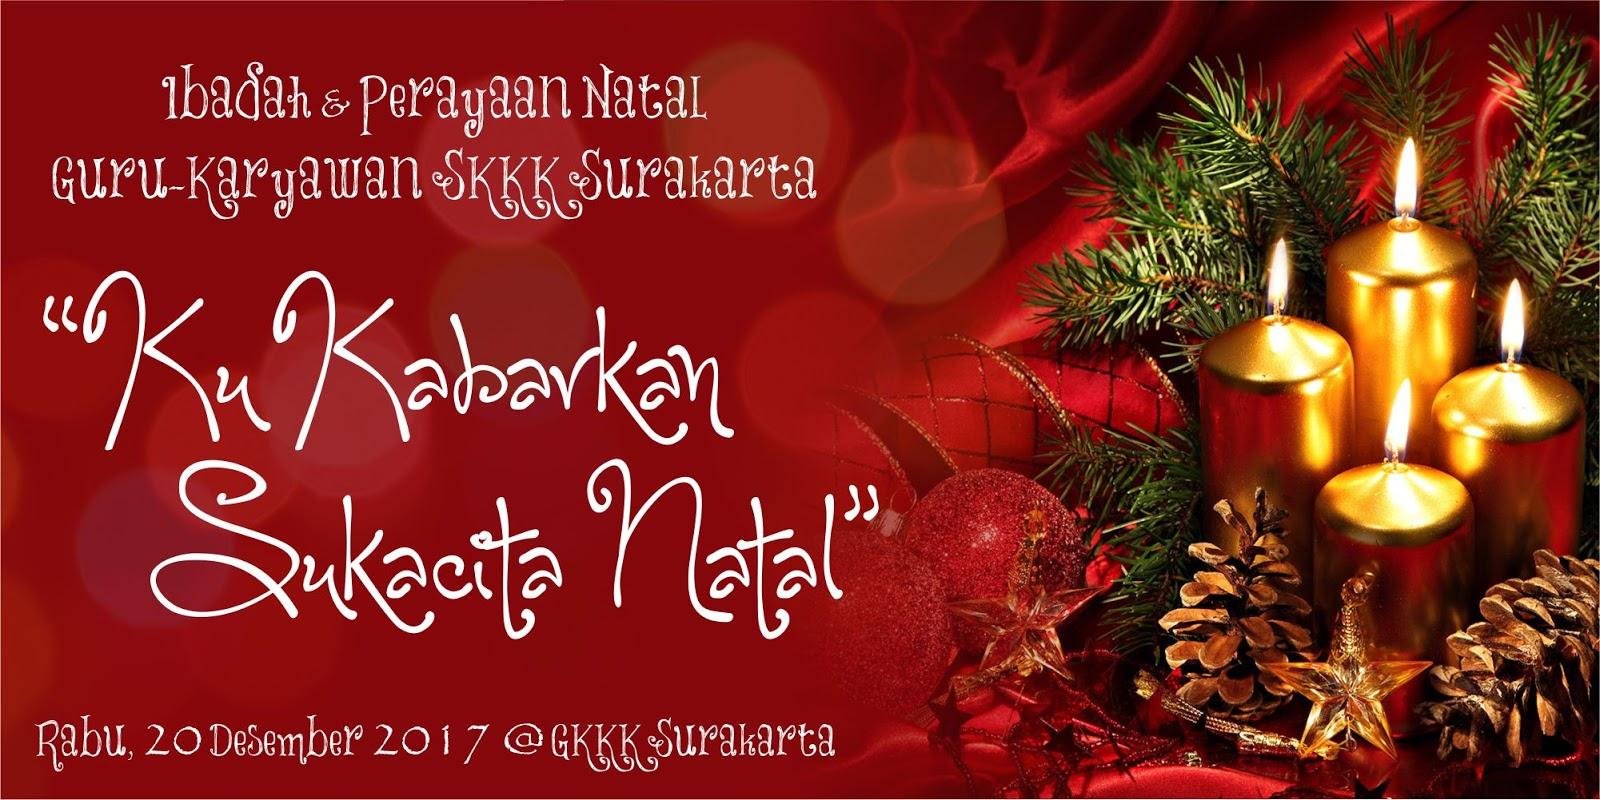 Ku Kabarkan Sukacita Natal: Ibadah & Perayaan Natal SKKK Surakarta